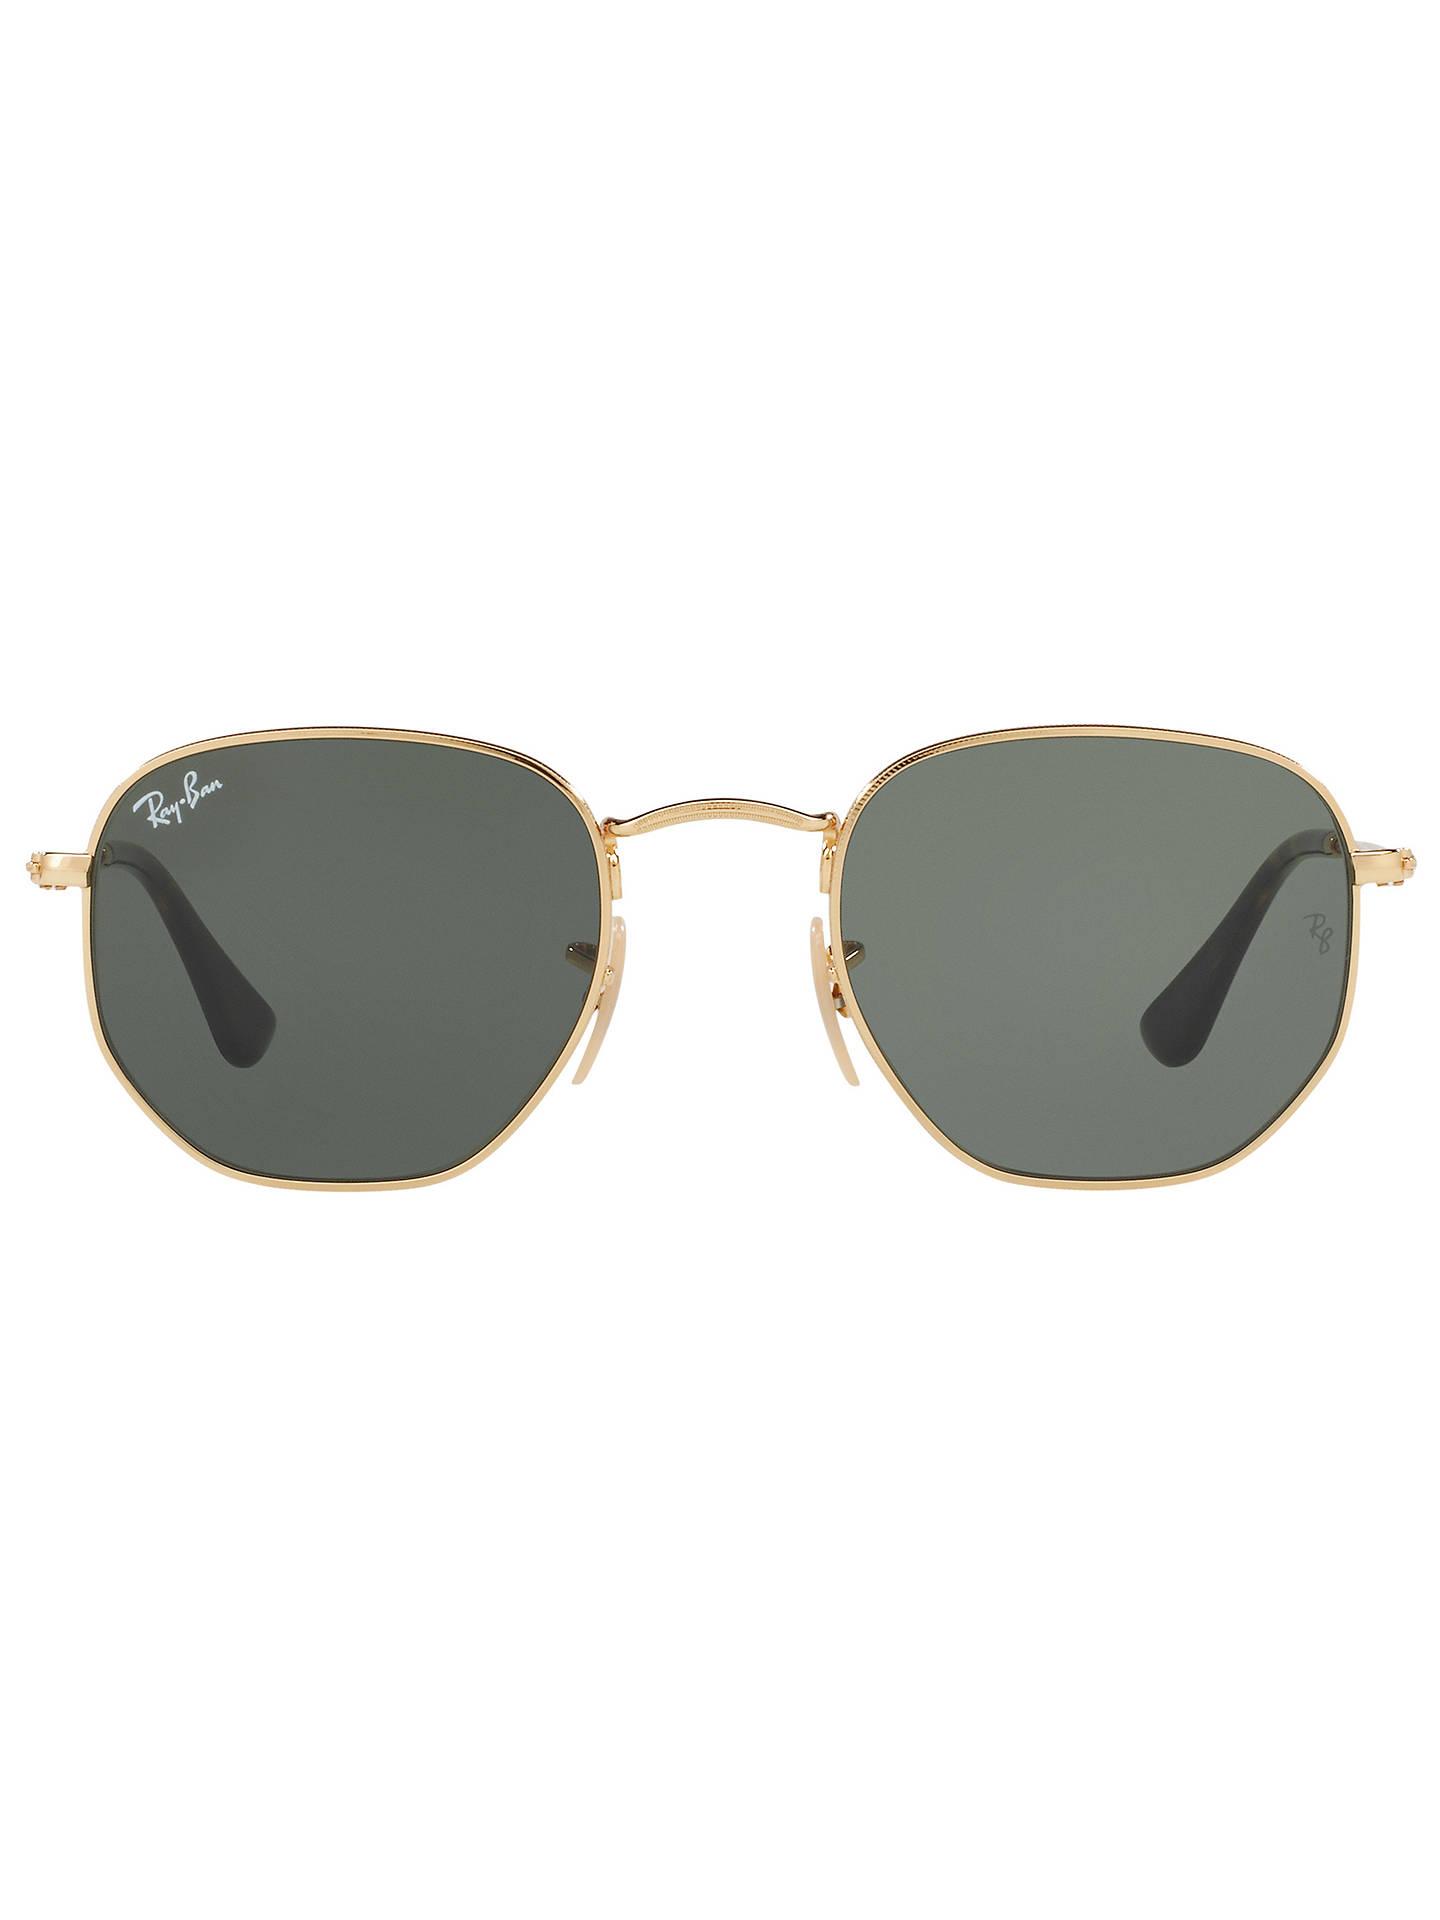 9bc46c3f837 Ray-Ban RB3548 Hexagonal Flat Lens Sunglasses at John Lewis   Partners